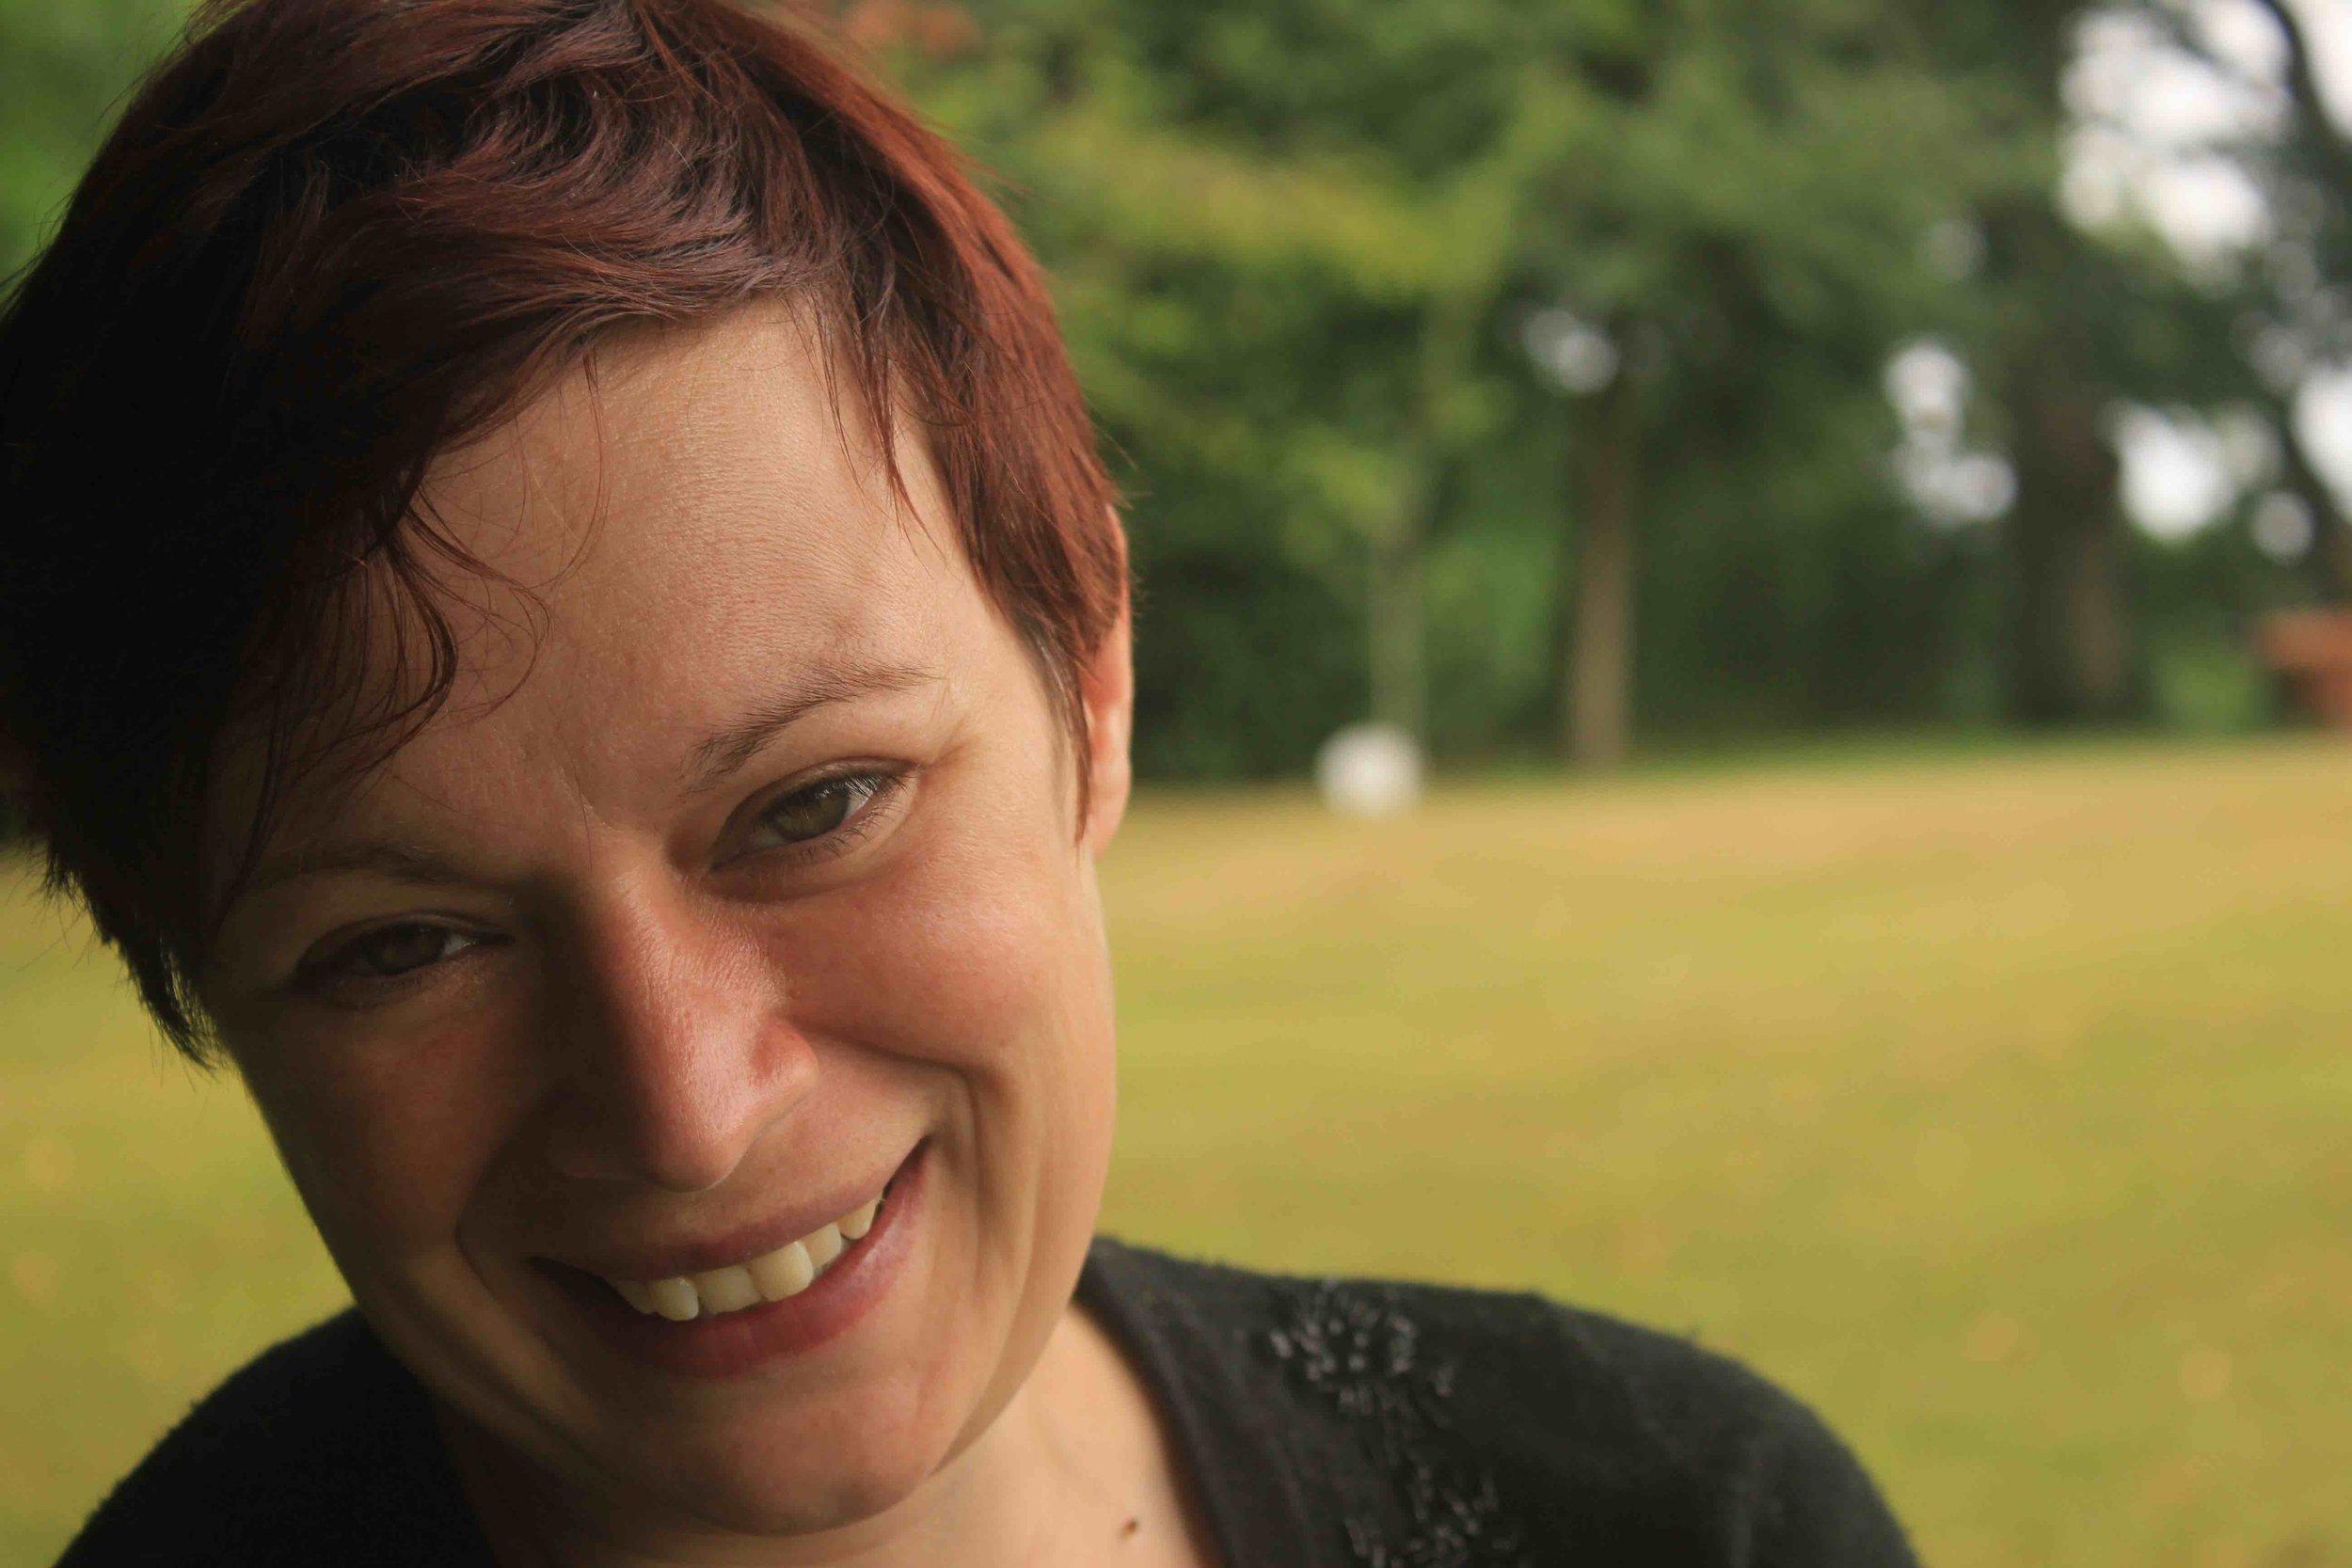 Emma Robertson - Just Treatment patient leader